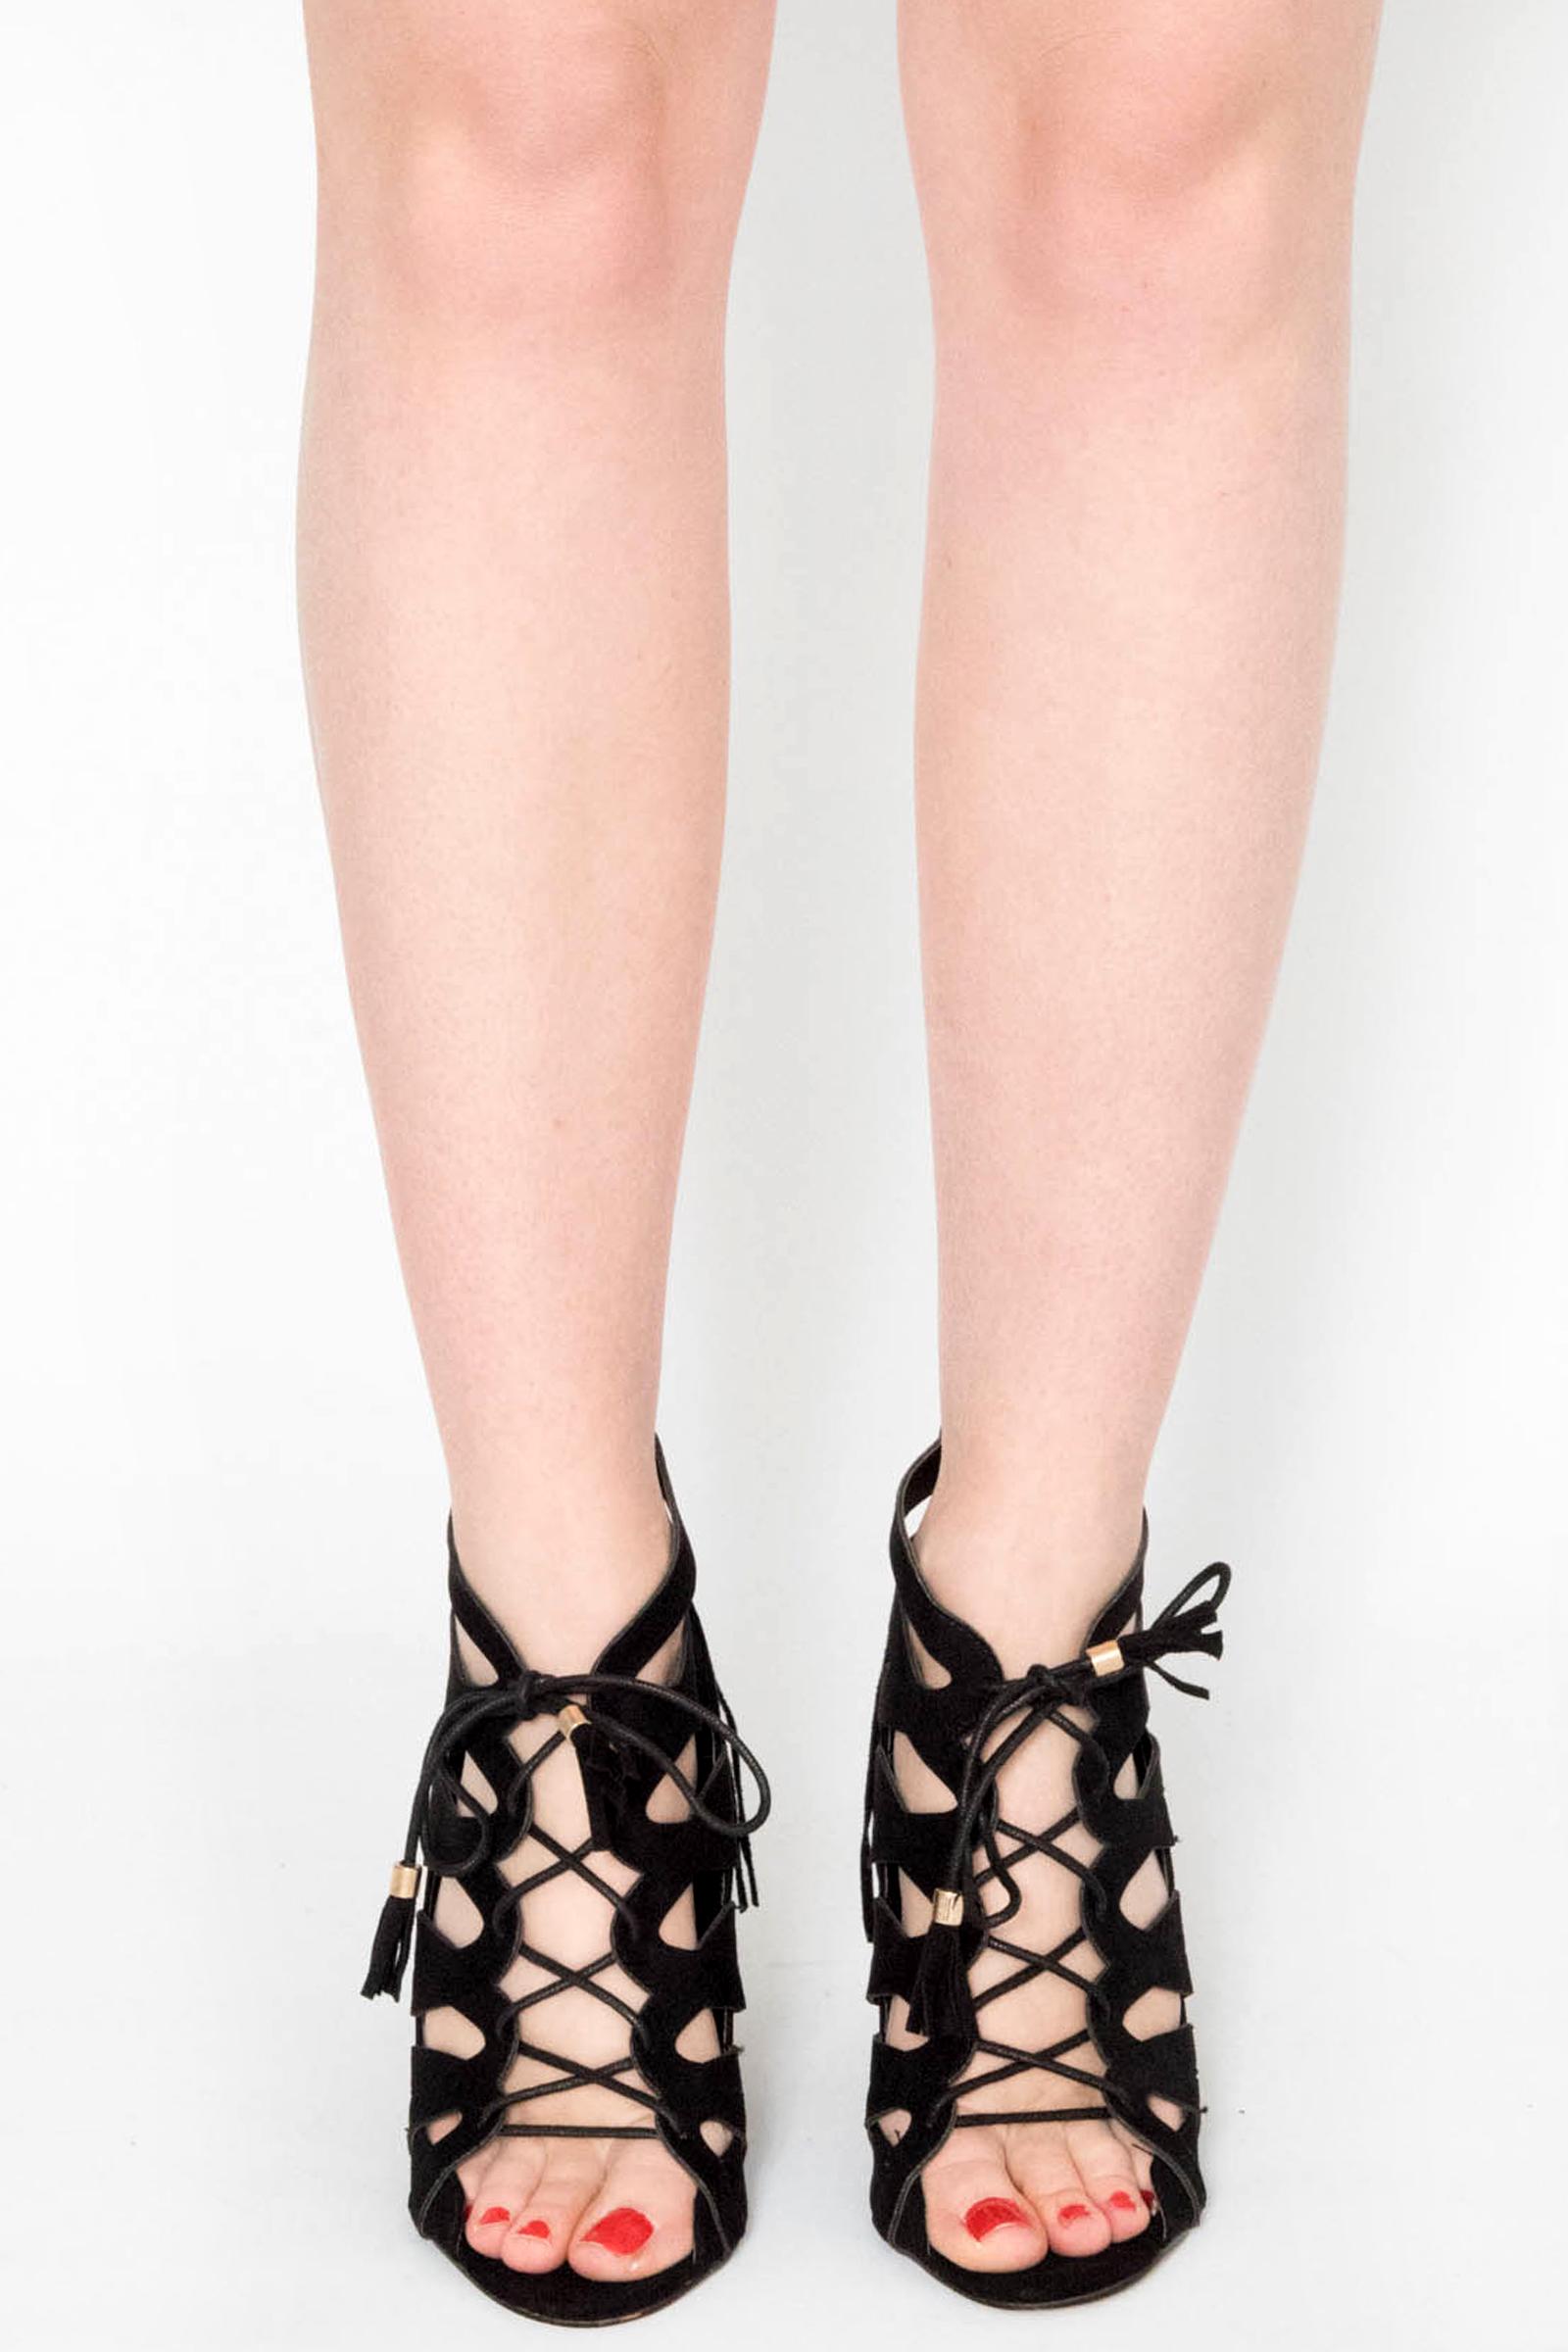 739a684125 Lara Black Faux Suede Lace Up Heels | Shoes | Modamore